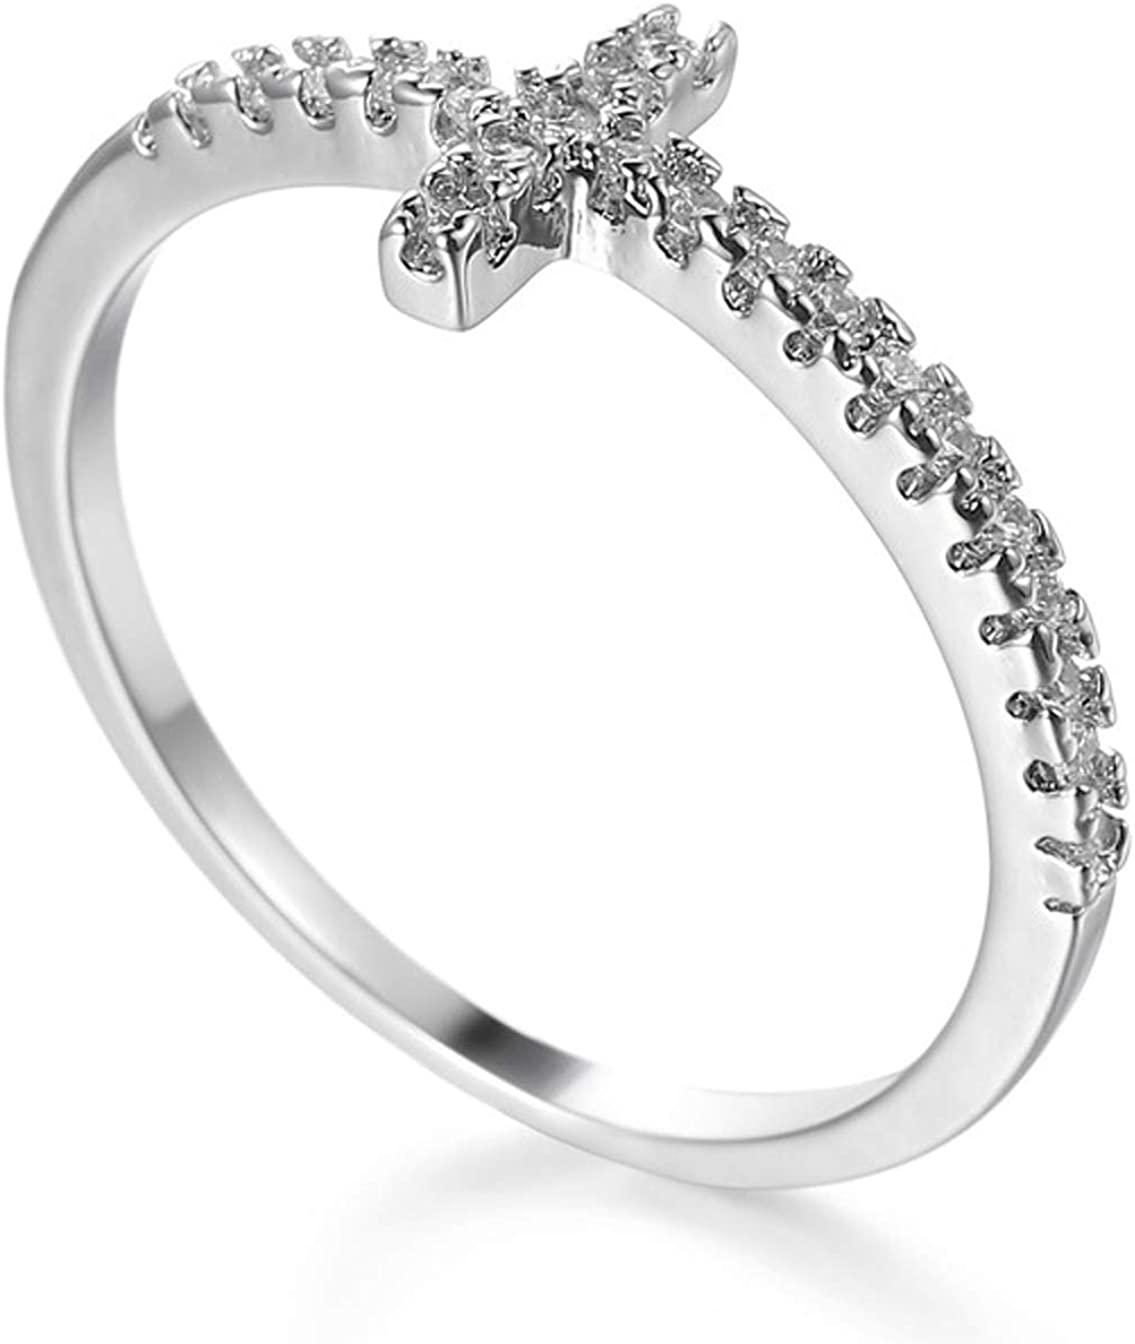 Aivdoirla Cubic Zirconia Rings Sideways Cross Ring Promise Ring Diamond CZ Brass White Gold Plated Wedding Engagement Anniversary Rings for Women Sizes 6 to 10